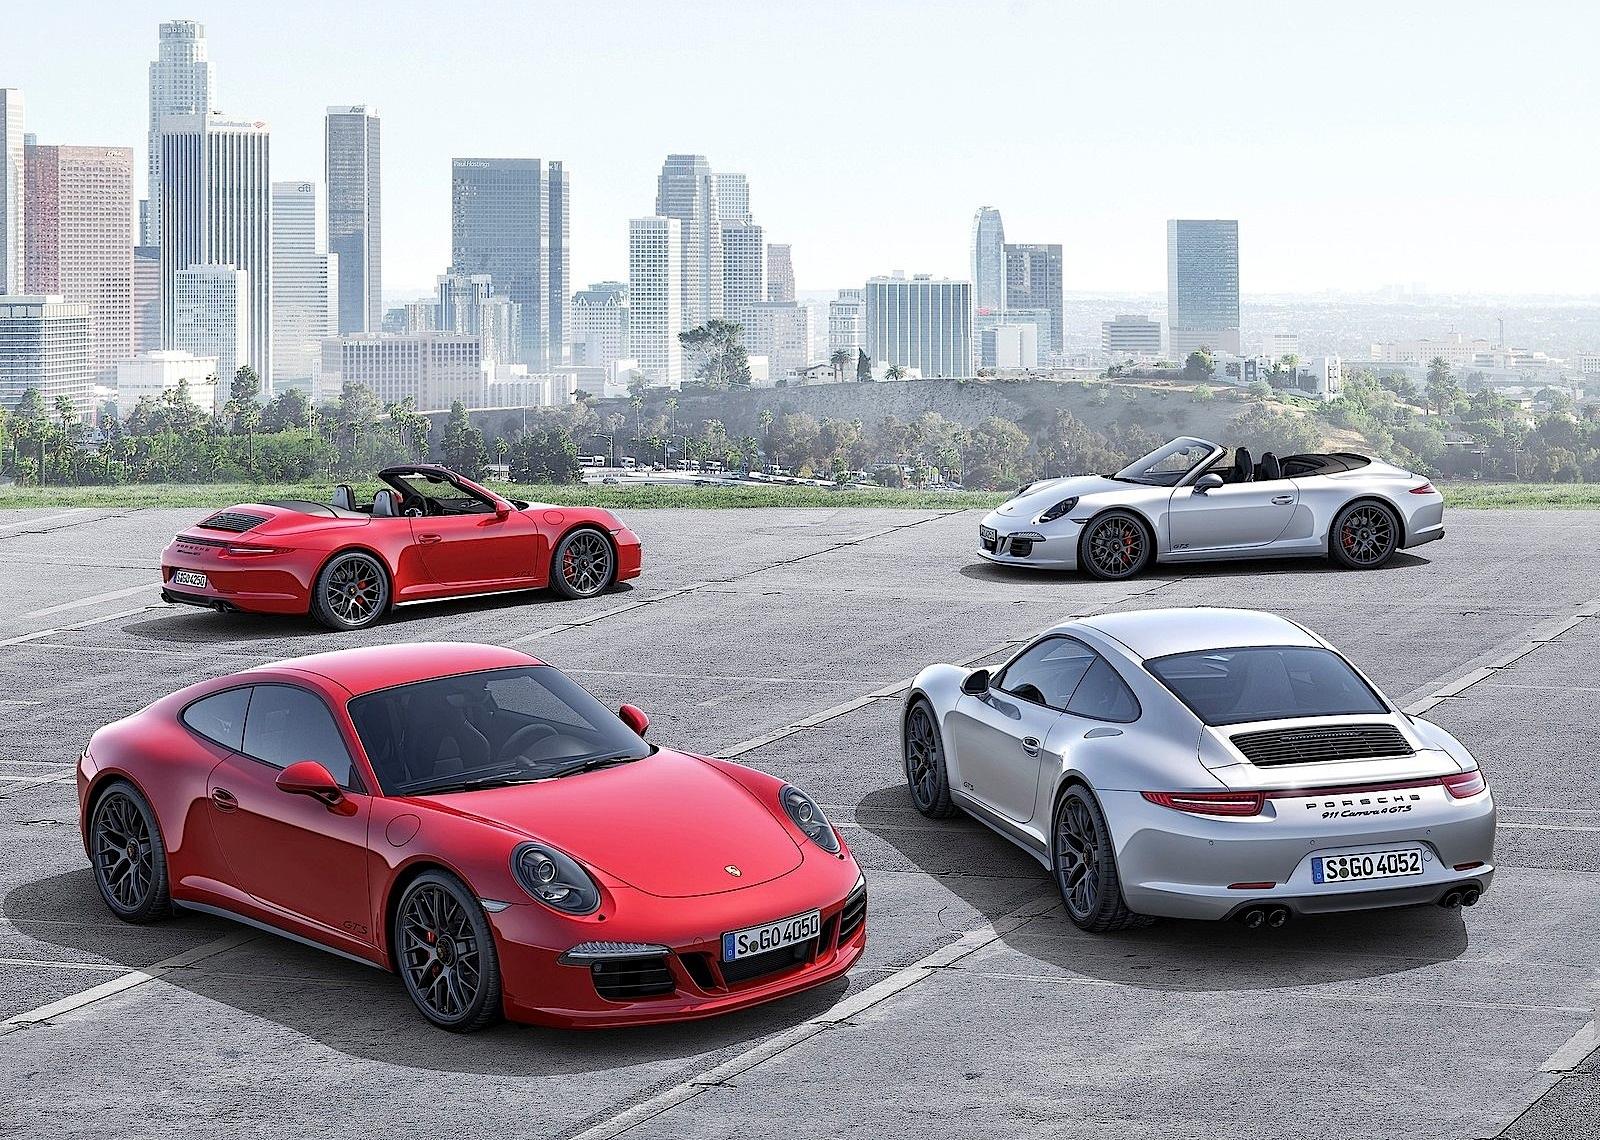 porsche 911 carrera 4 gts cabriolet specs 2014 2015 2016 2017 2018 autoevolution. Black Bedroom Furniture Sets. Home Design Ideas